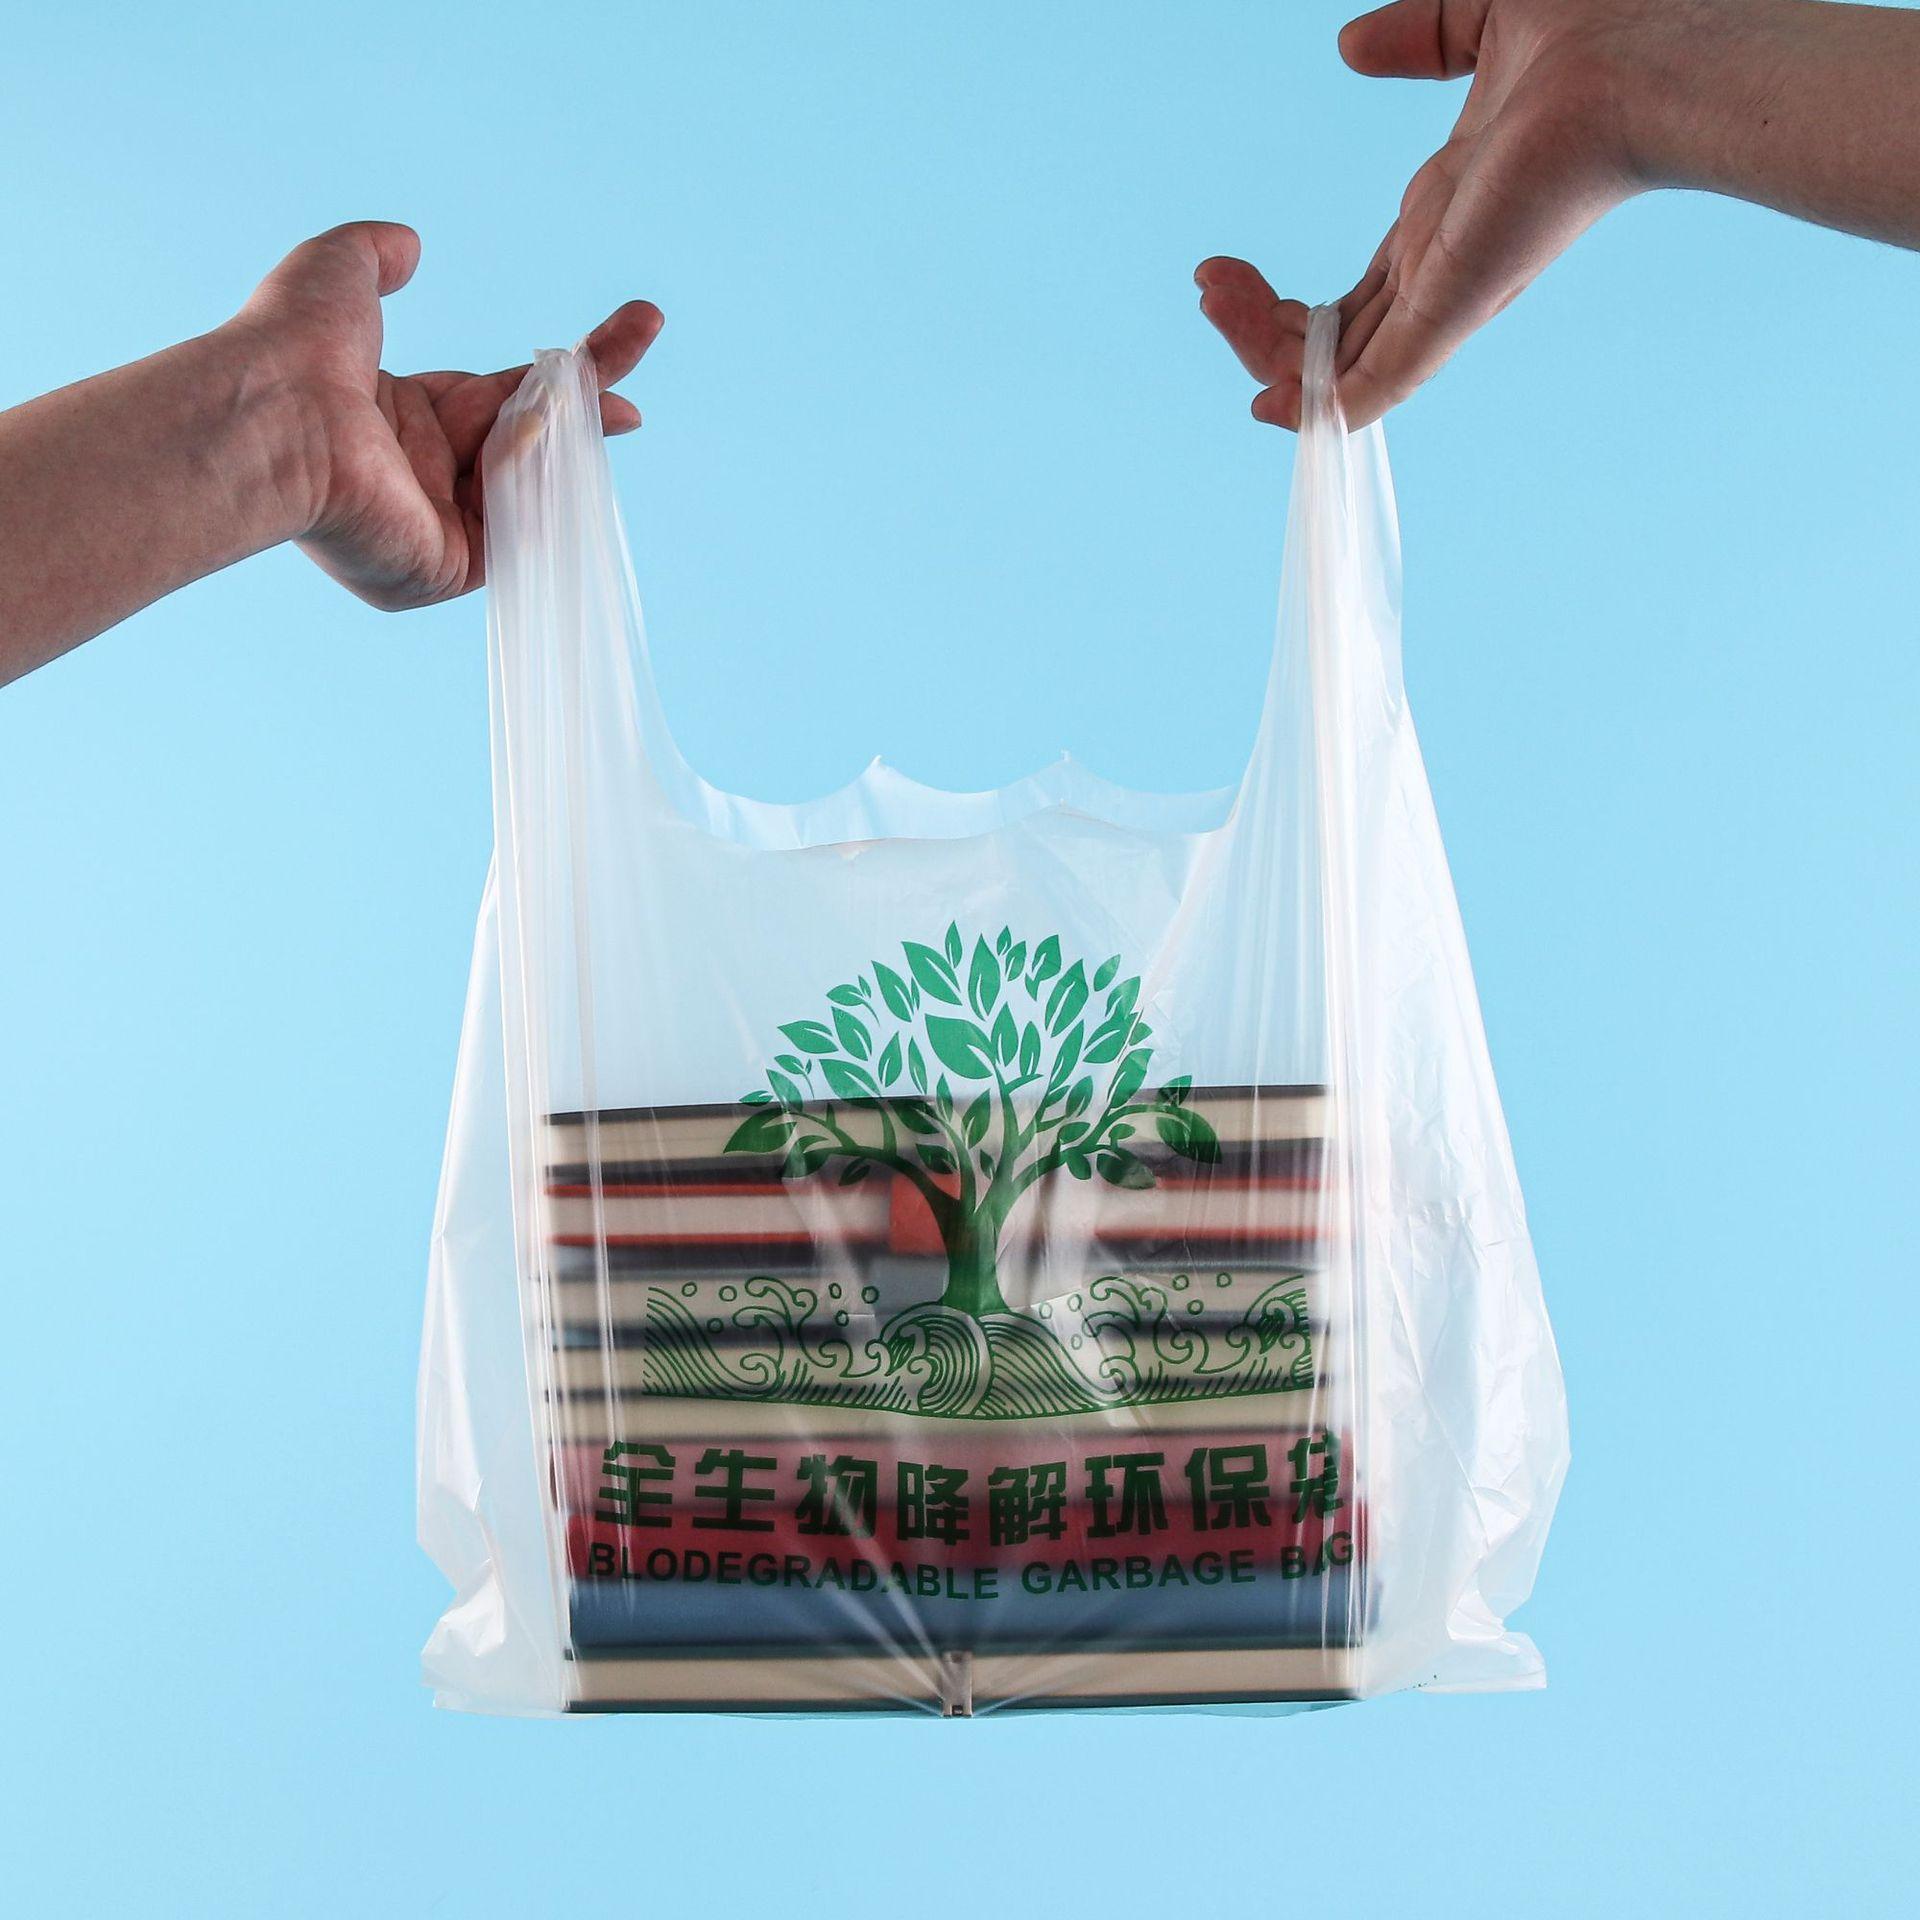 Fully degradable biodegradable plastic bag vest bag handbag custom biodegradable garbage bag packing